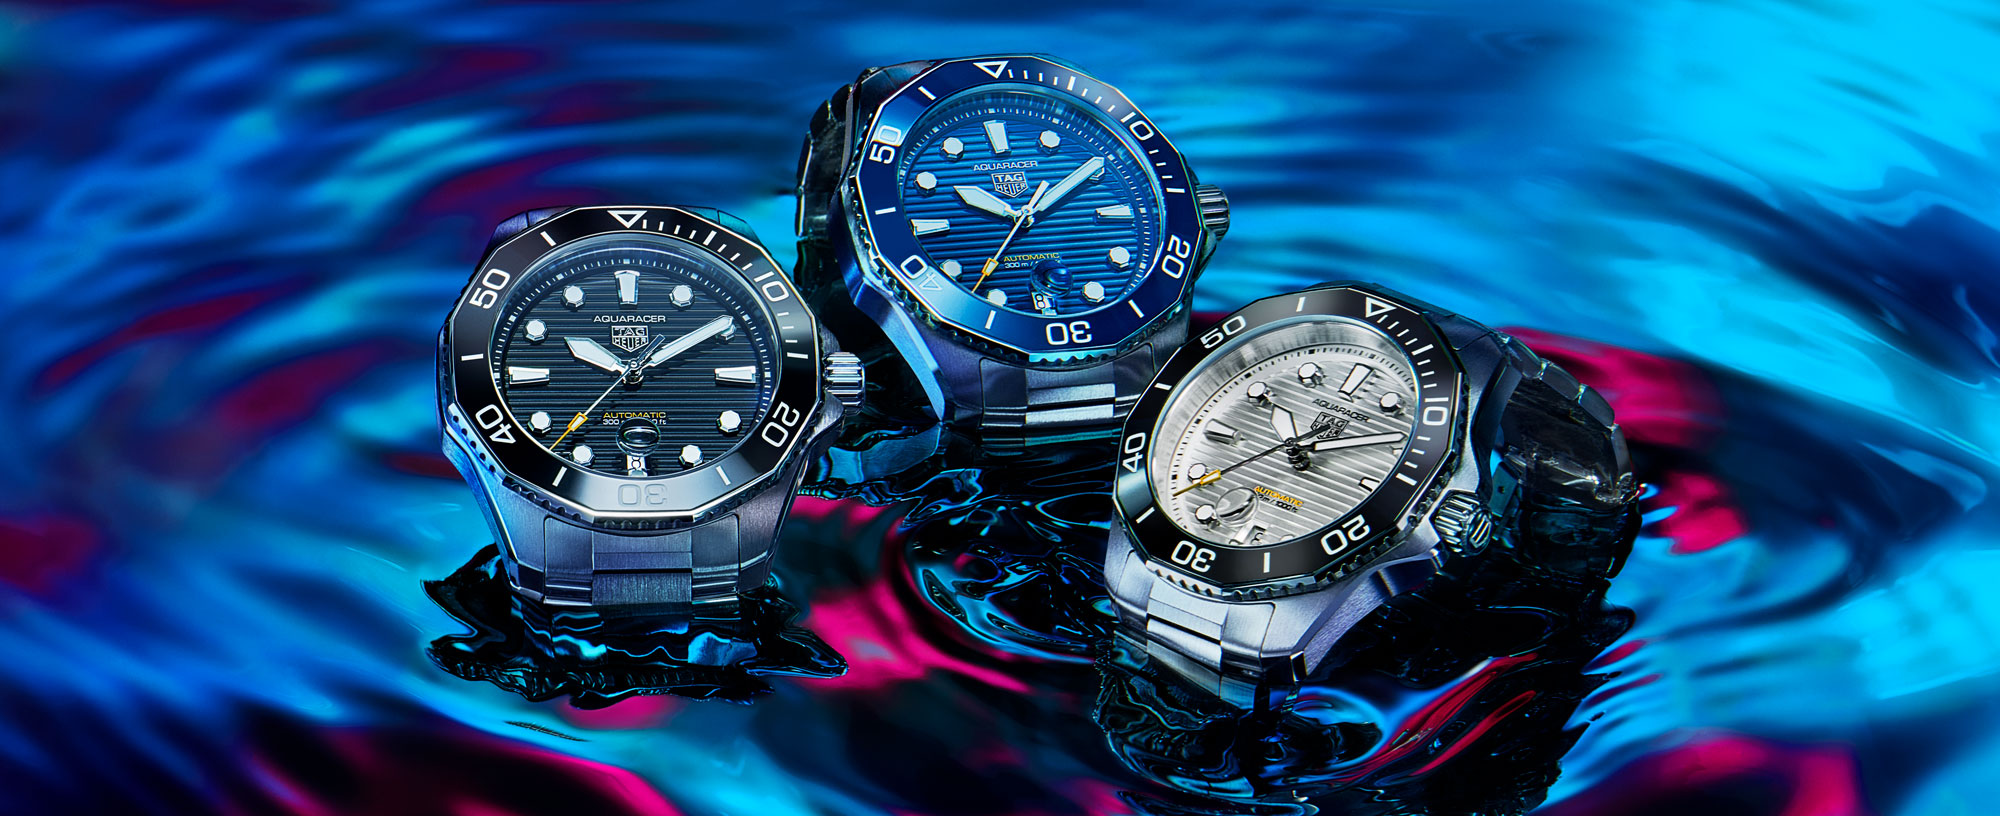 Watches & Wonders TAG Heuer